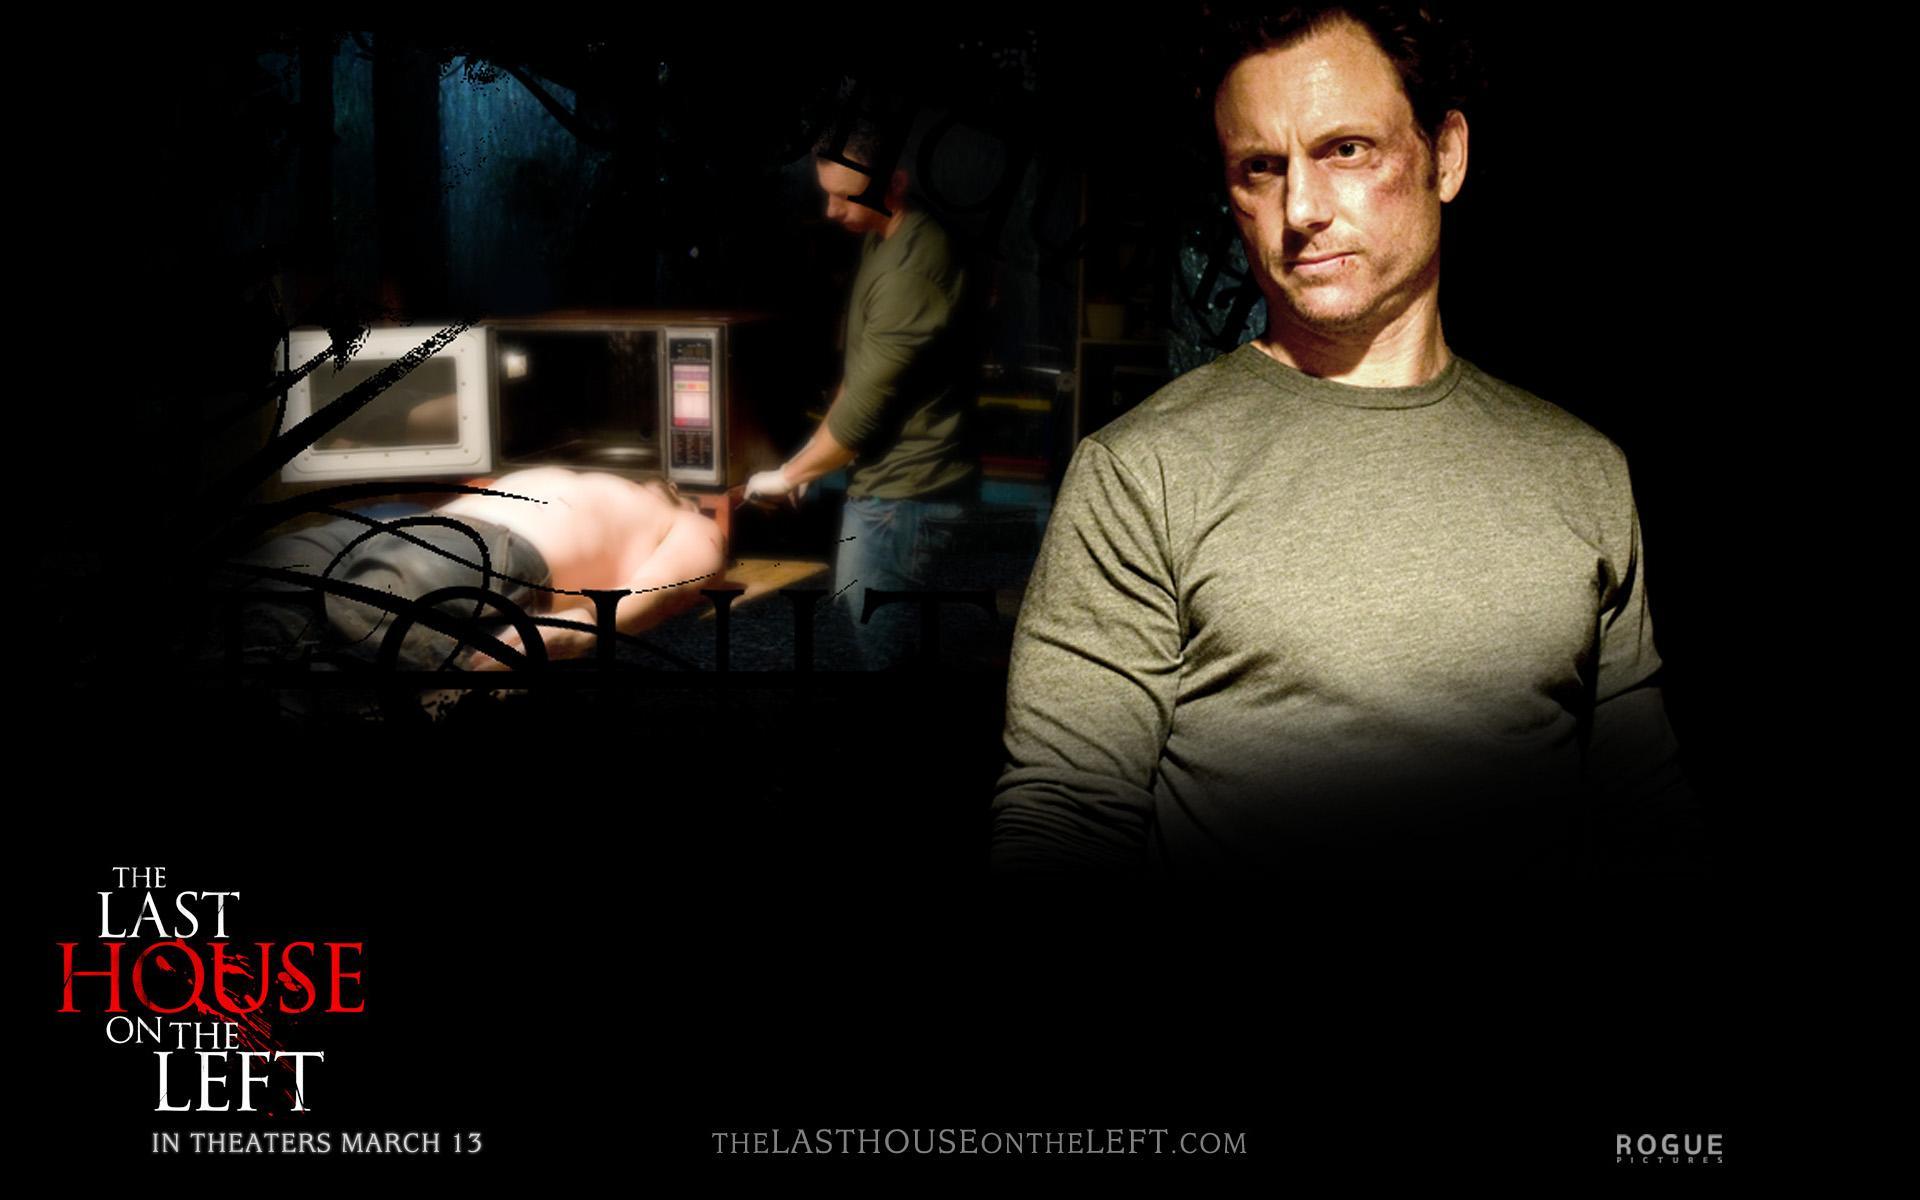 the last house on the left (2009) – horrorpedia